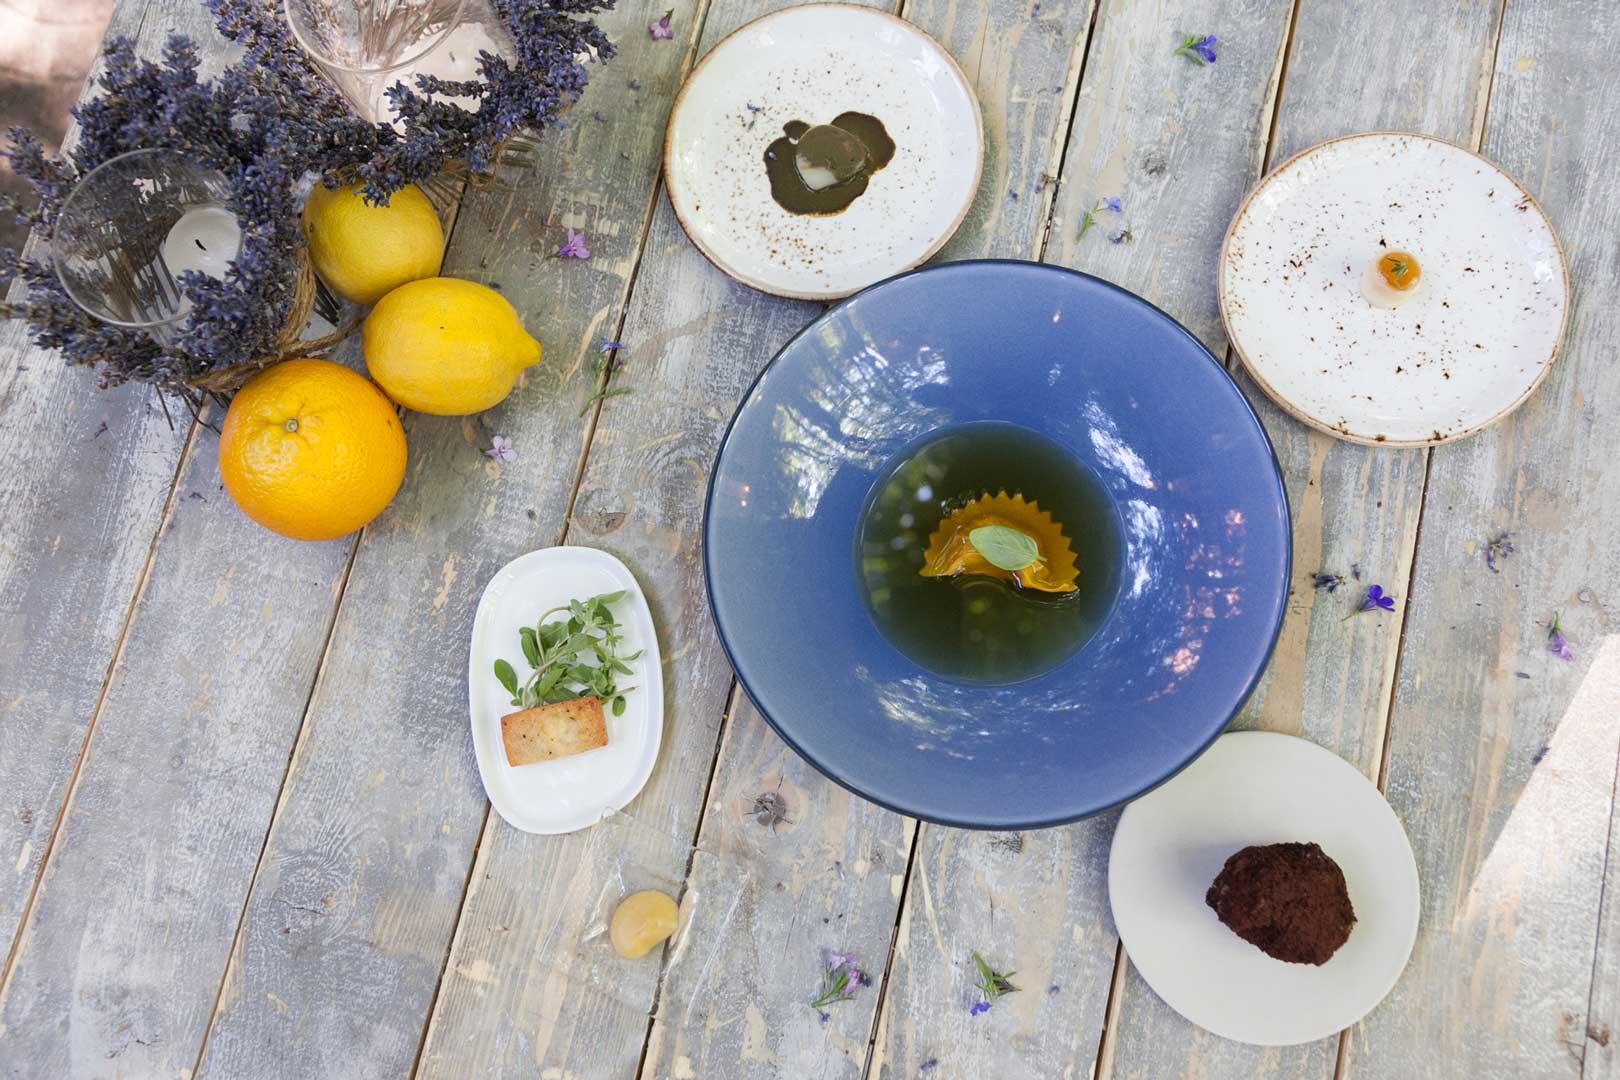 Grey Goose Atelier of Taste @ Sheraton Diana Majestic   Piatti Luigi Taglienti